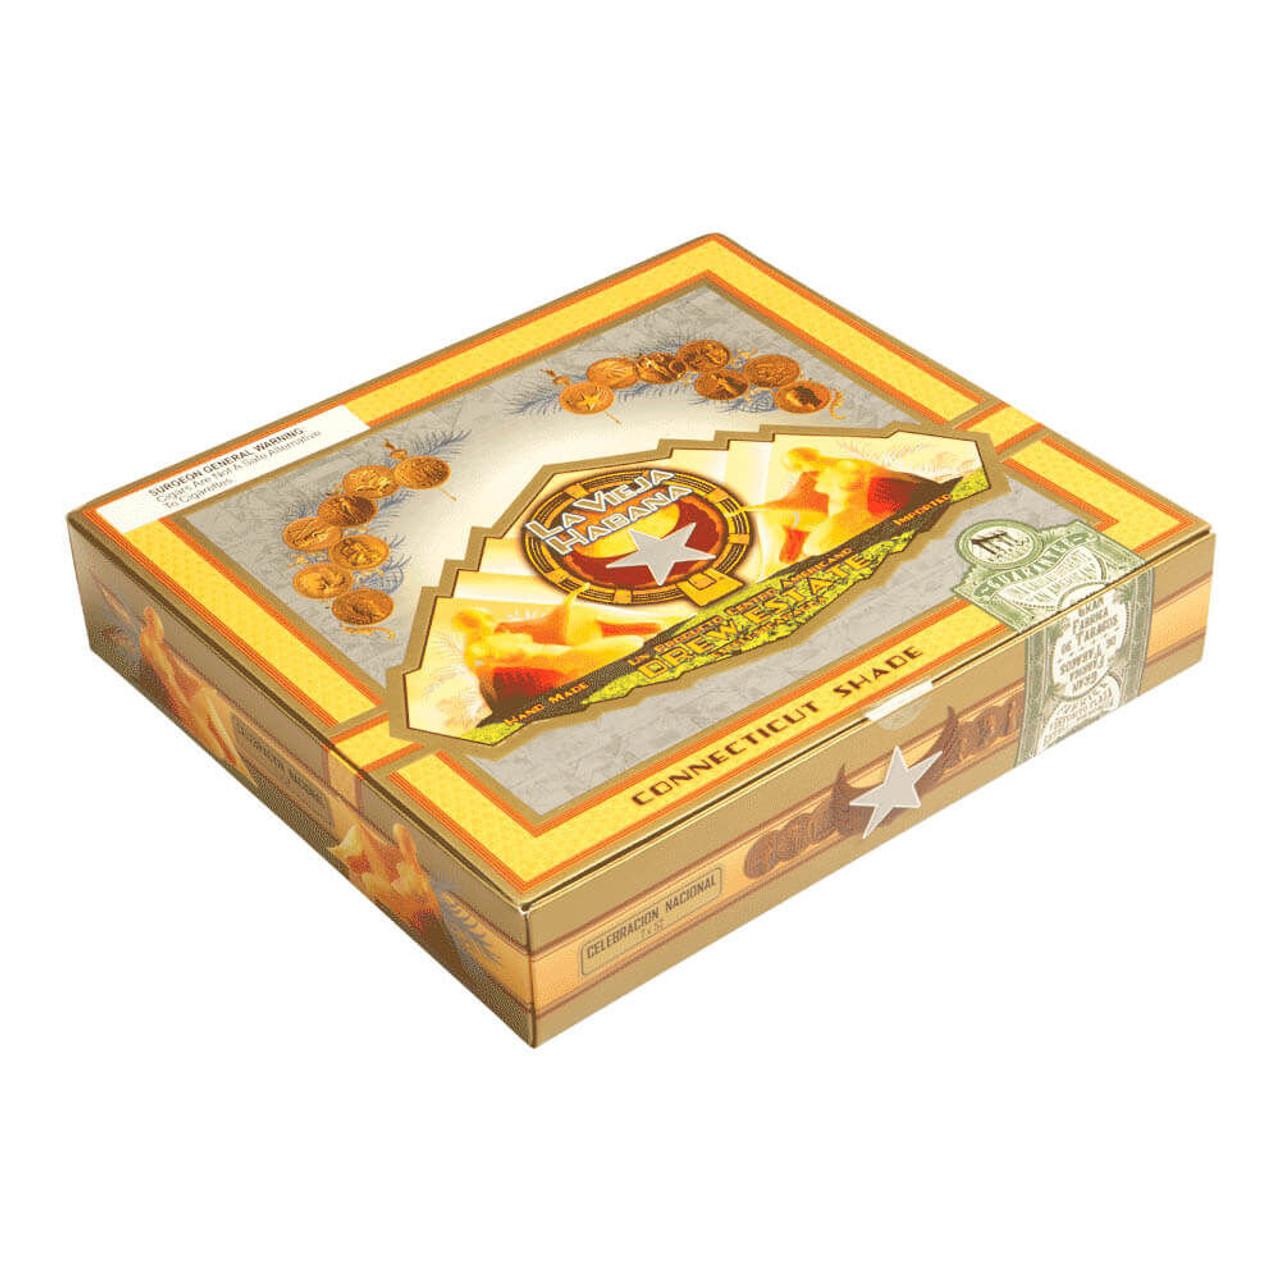 La Vieja Habana Celebracion CT Cigars - 7 x 52 (Box of 20)